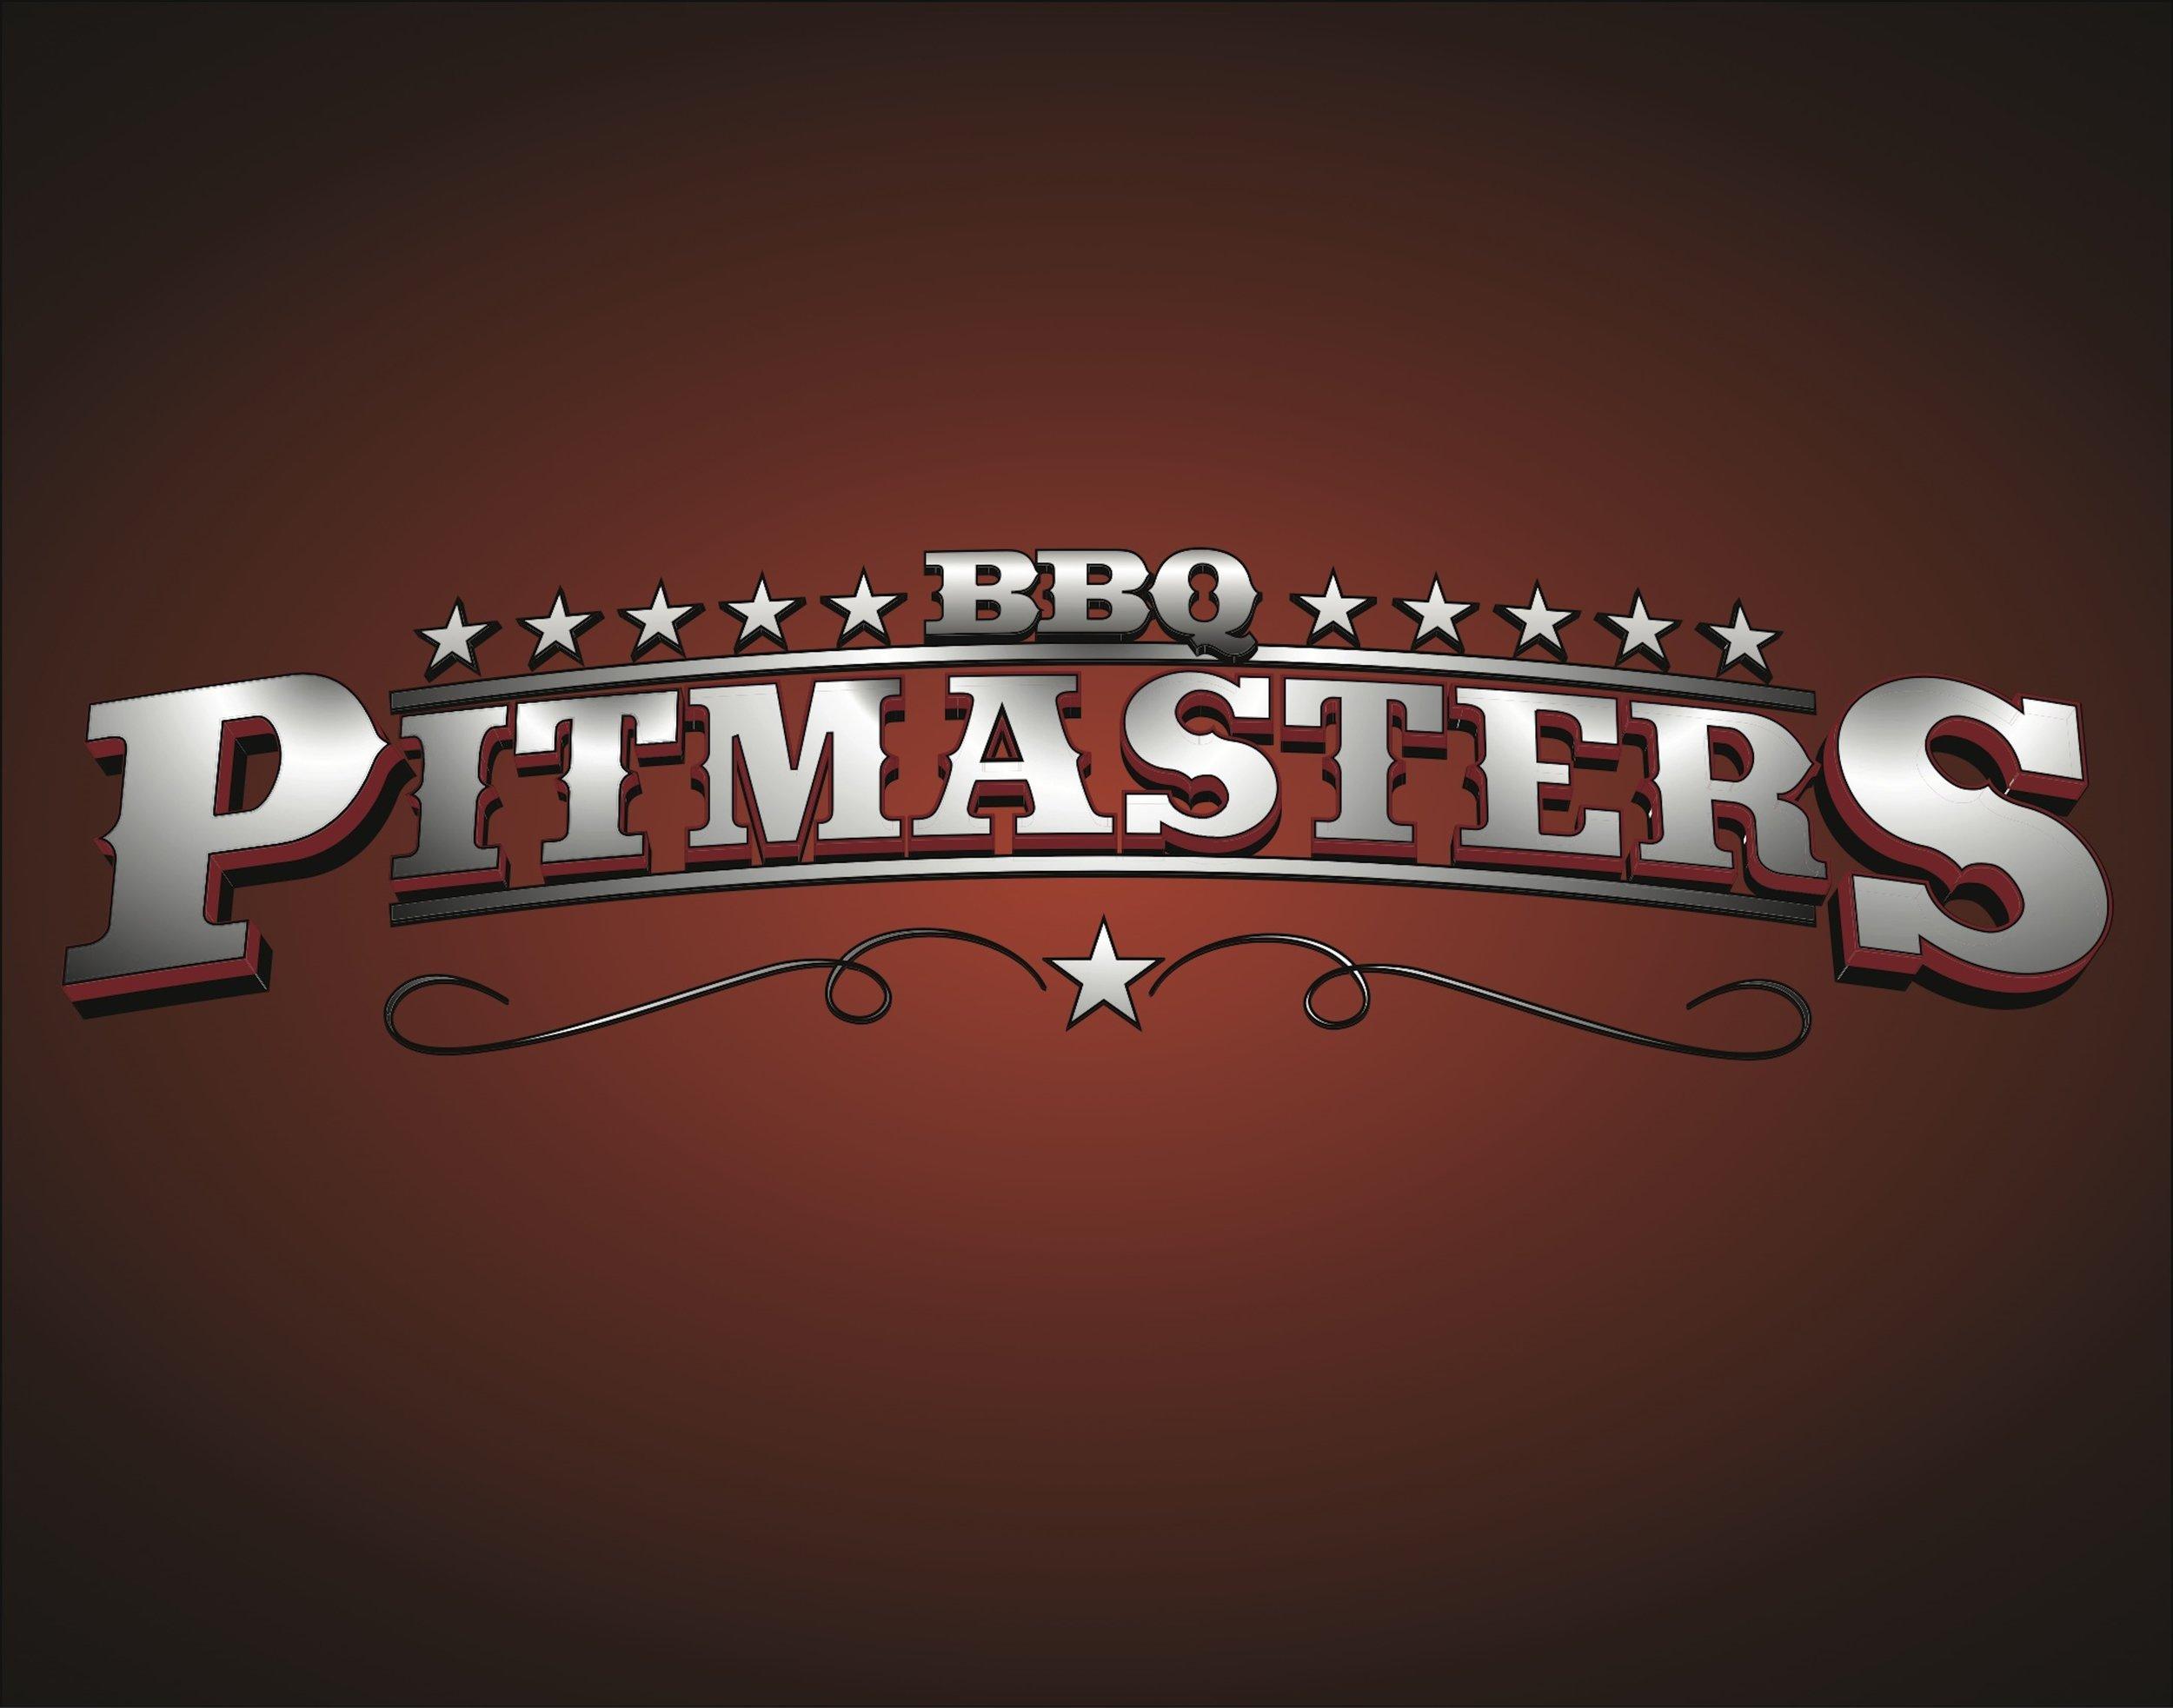 Pitmasters_logo_metal.jpg